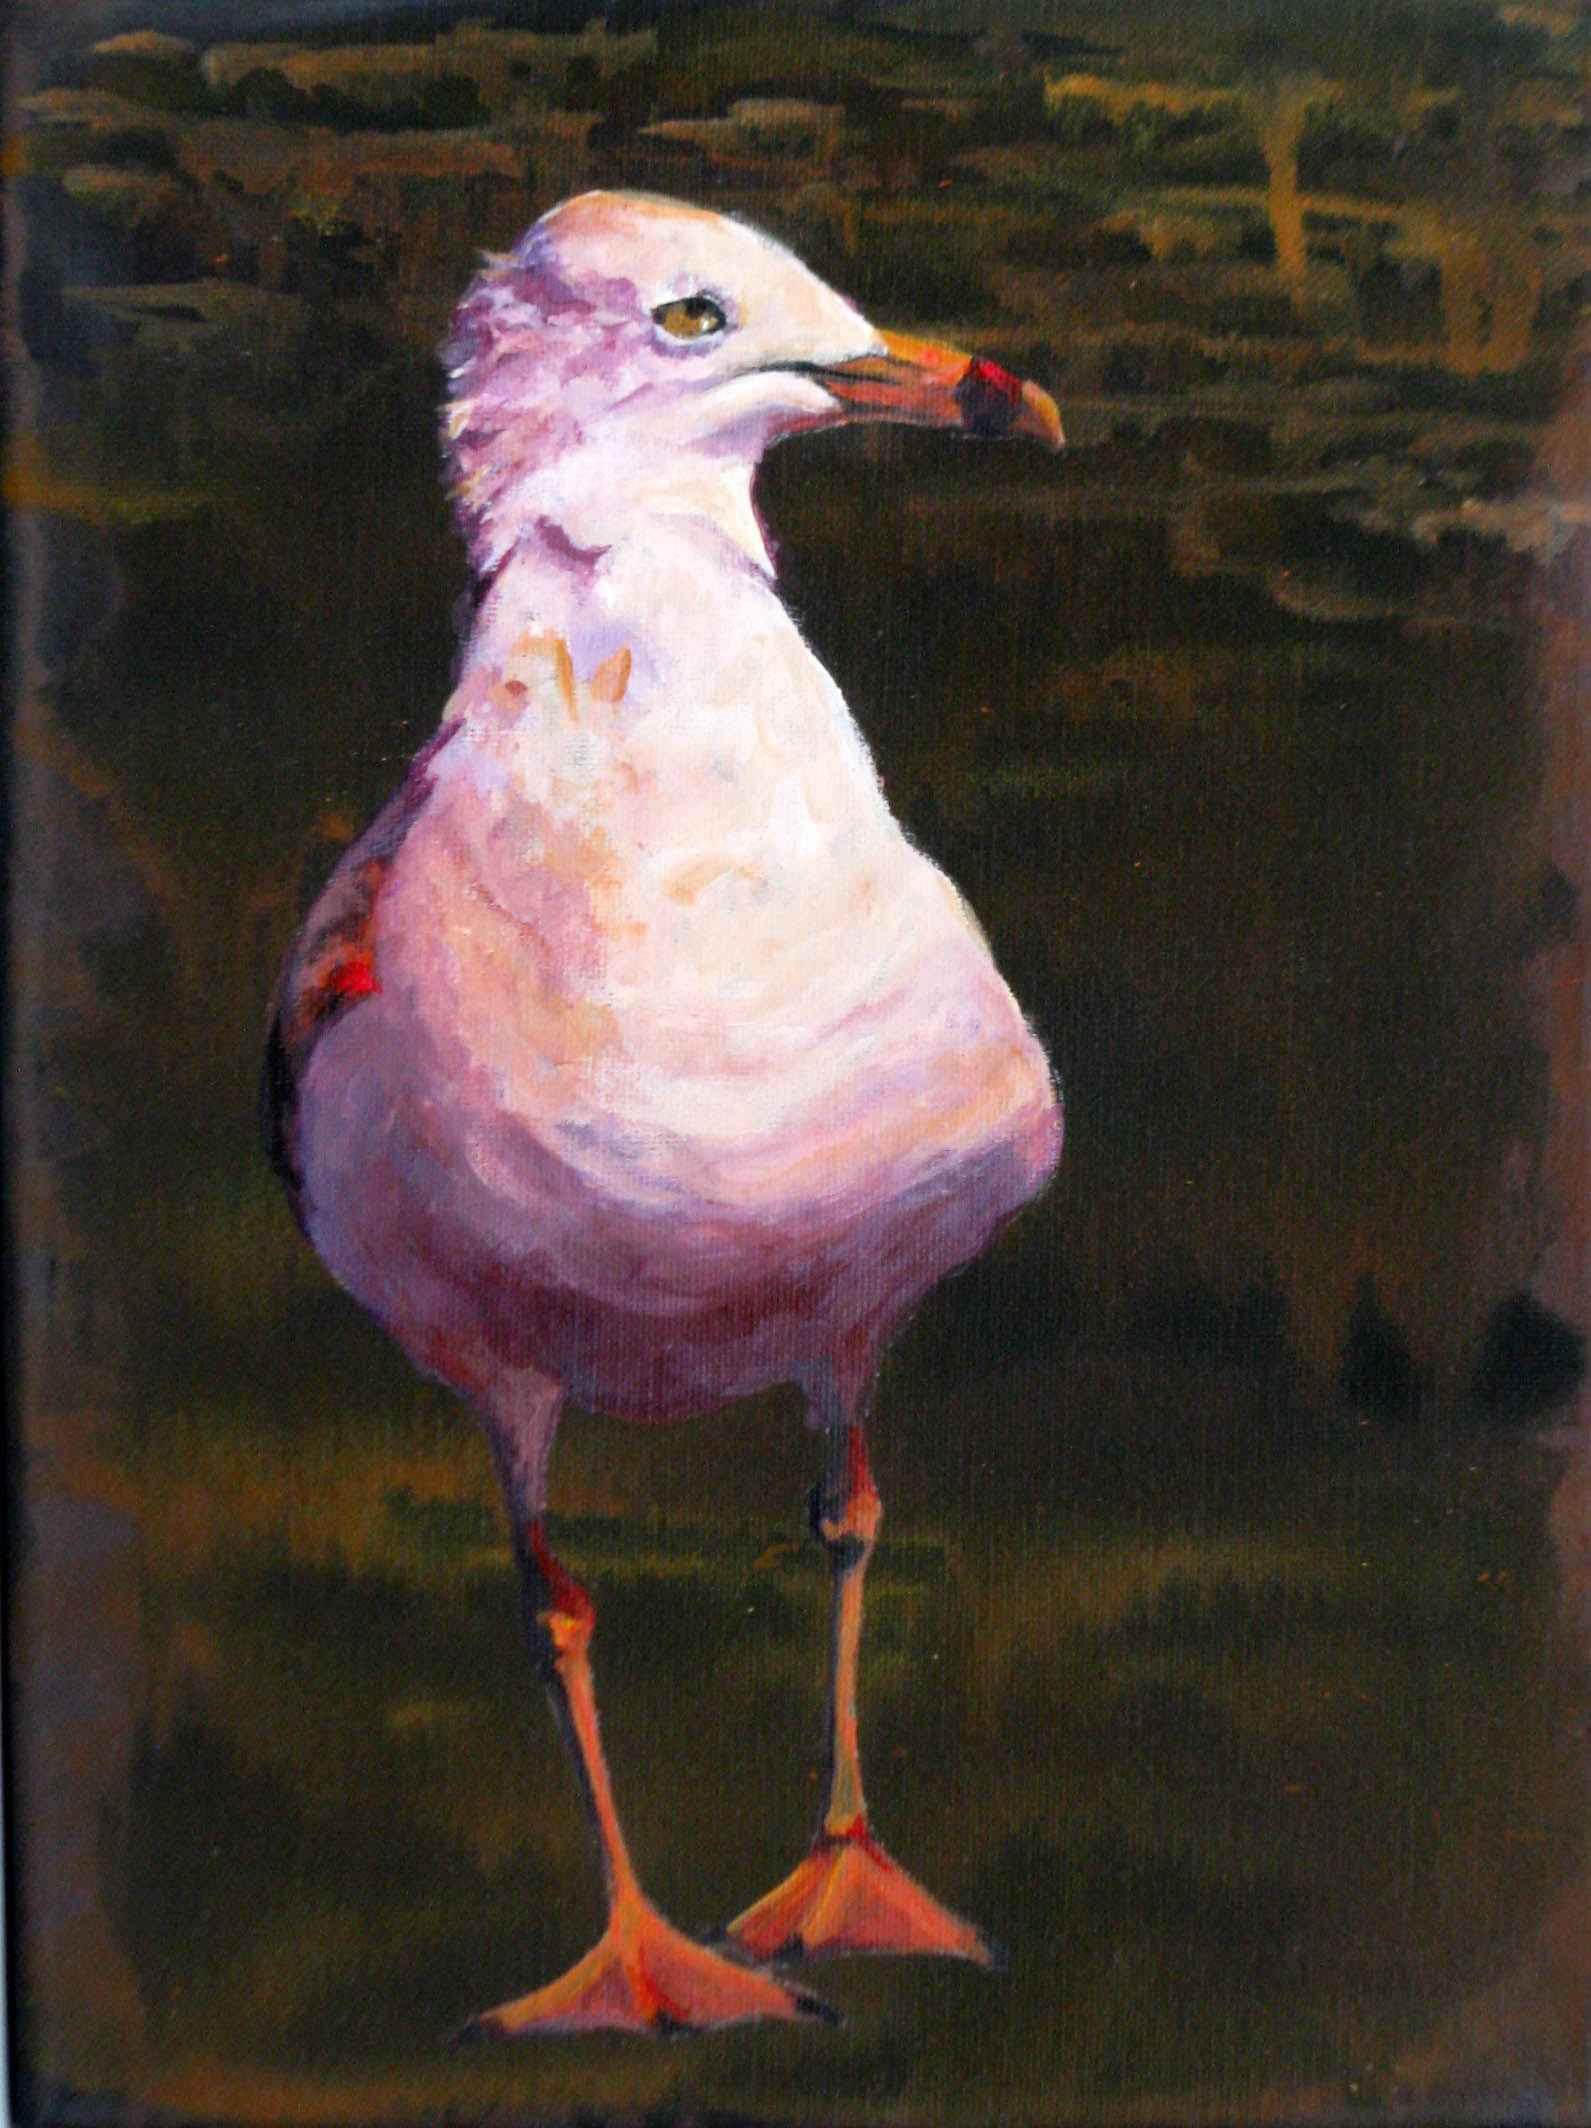 Gull at Dusk by  Pat Holscher - Masterpiece Online